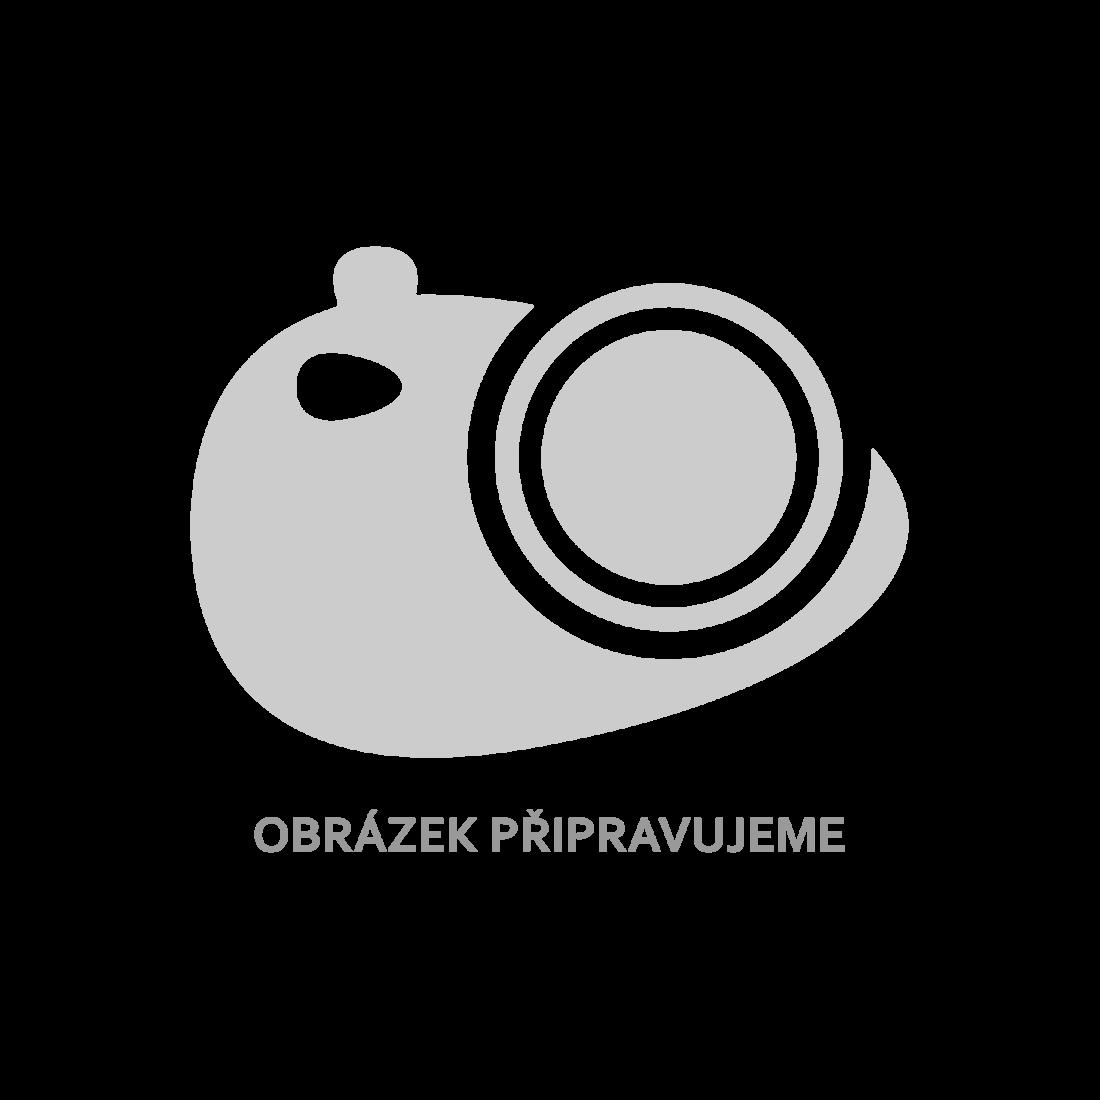 vidaXL Nástěnné TV skříňky 2 ks šedé 30,5 x 30 x 30 cm [804488]